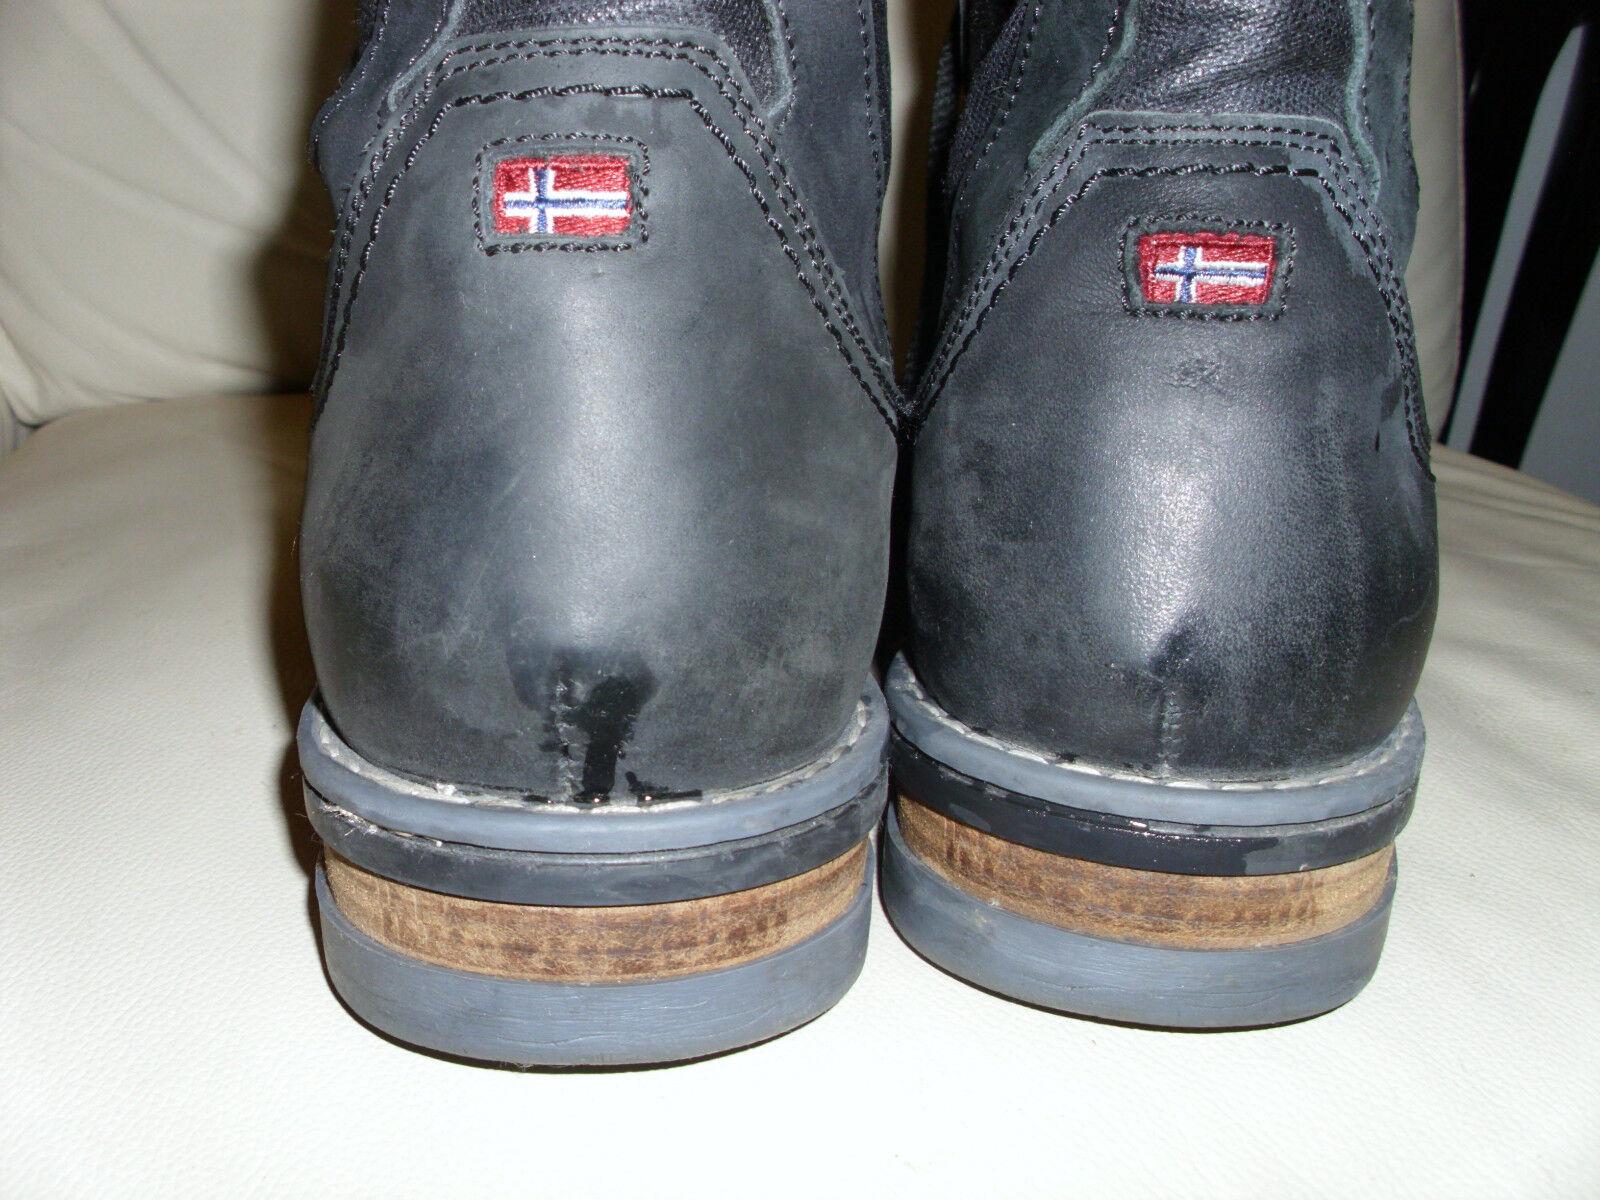 Napapijri NAPAPIJRI Stiefel Boots Gr.45 Leder Schwarz Flagge Flagge Flagge NP  Trendmarke 6bec91